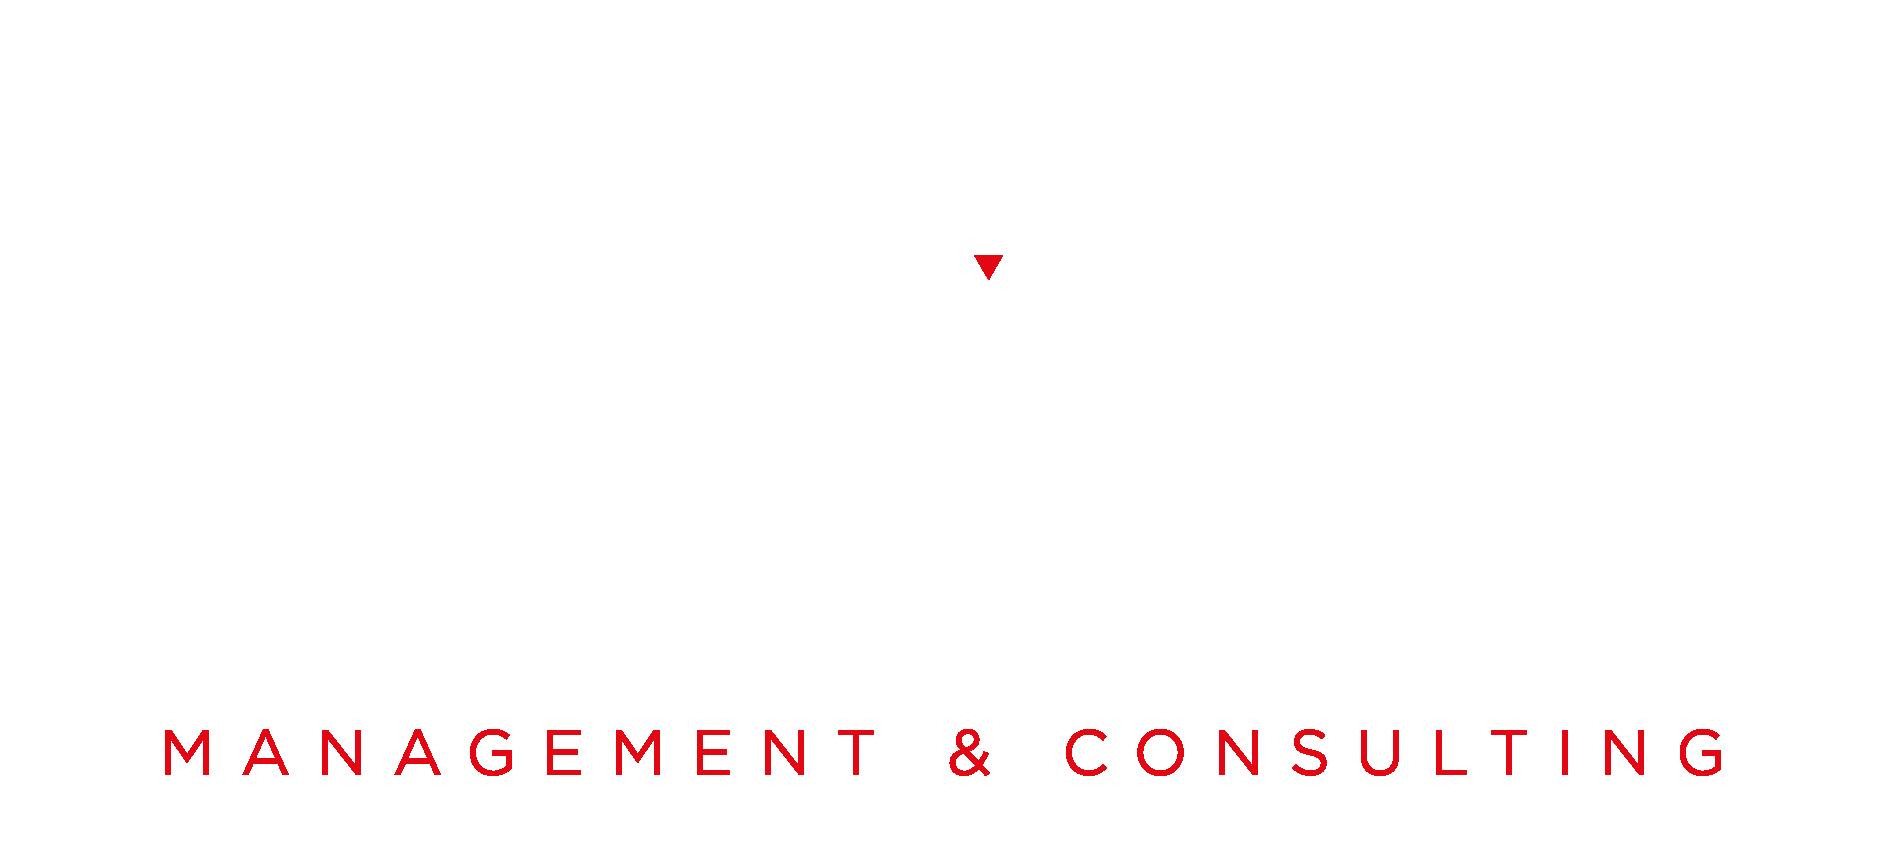 Logo Future Vision srl – bianco verticale